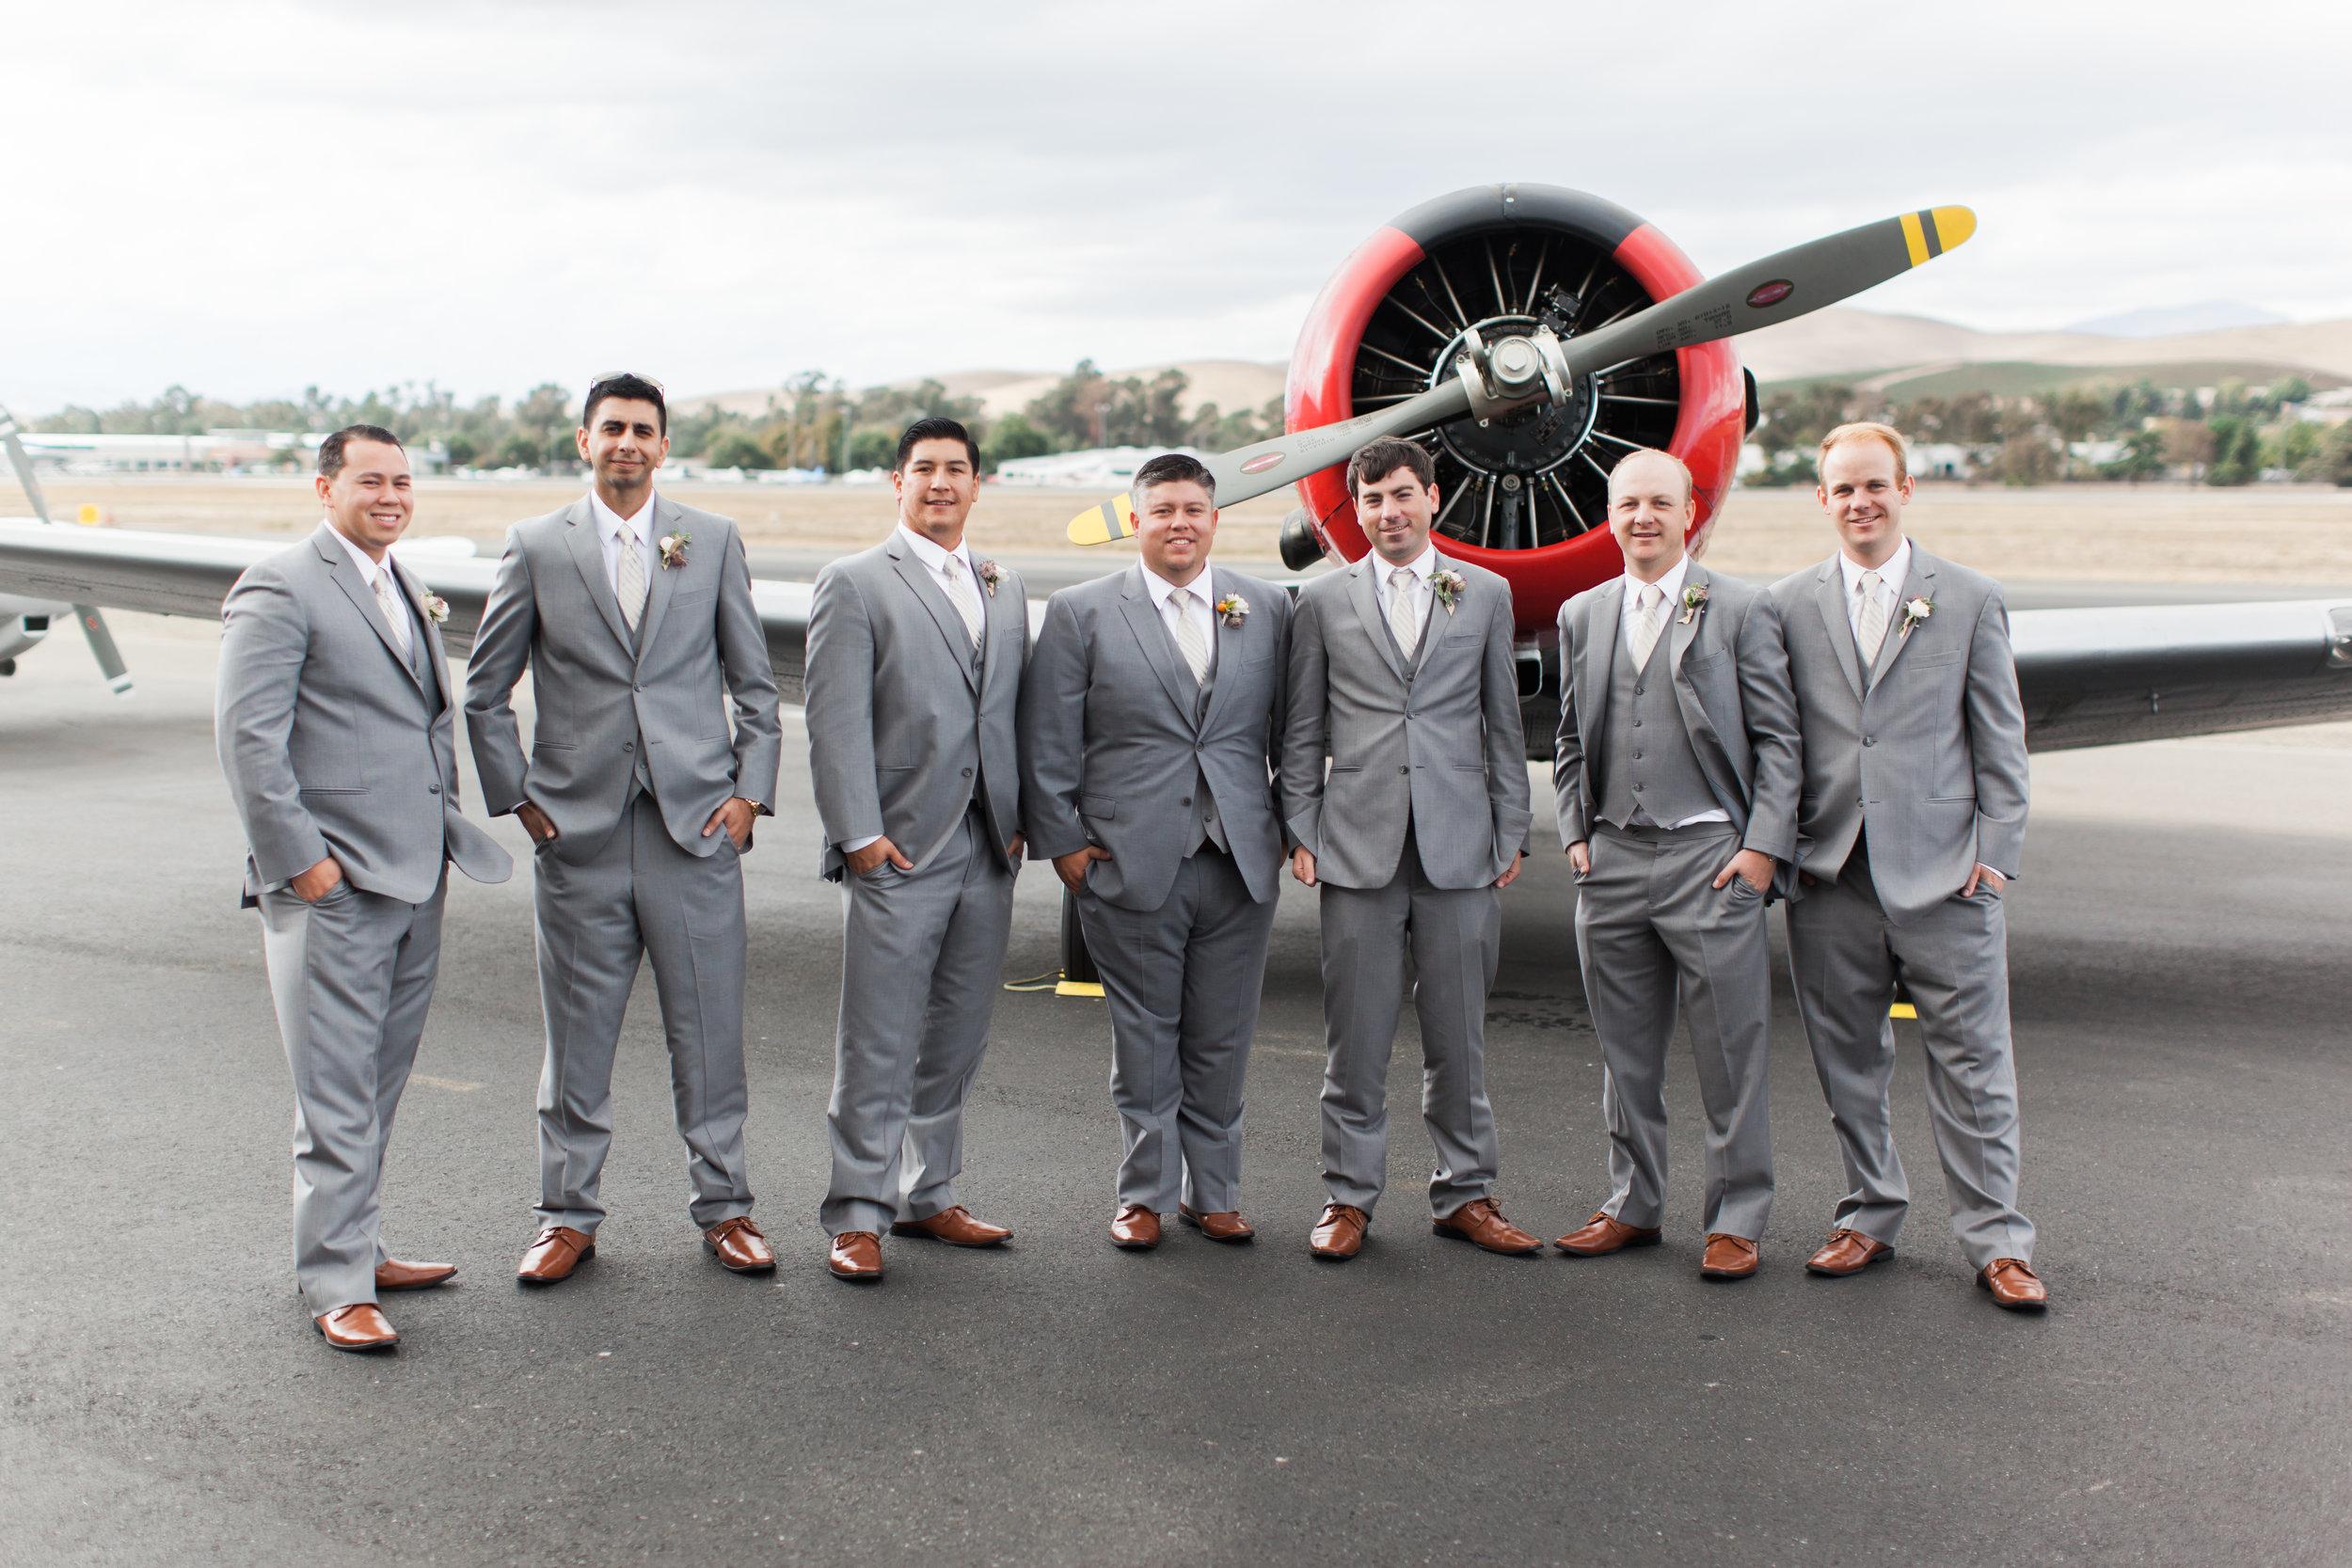 airport-hanger-wedding-at-attitude-aviation-in-livermore-20.jpg